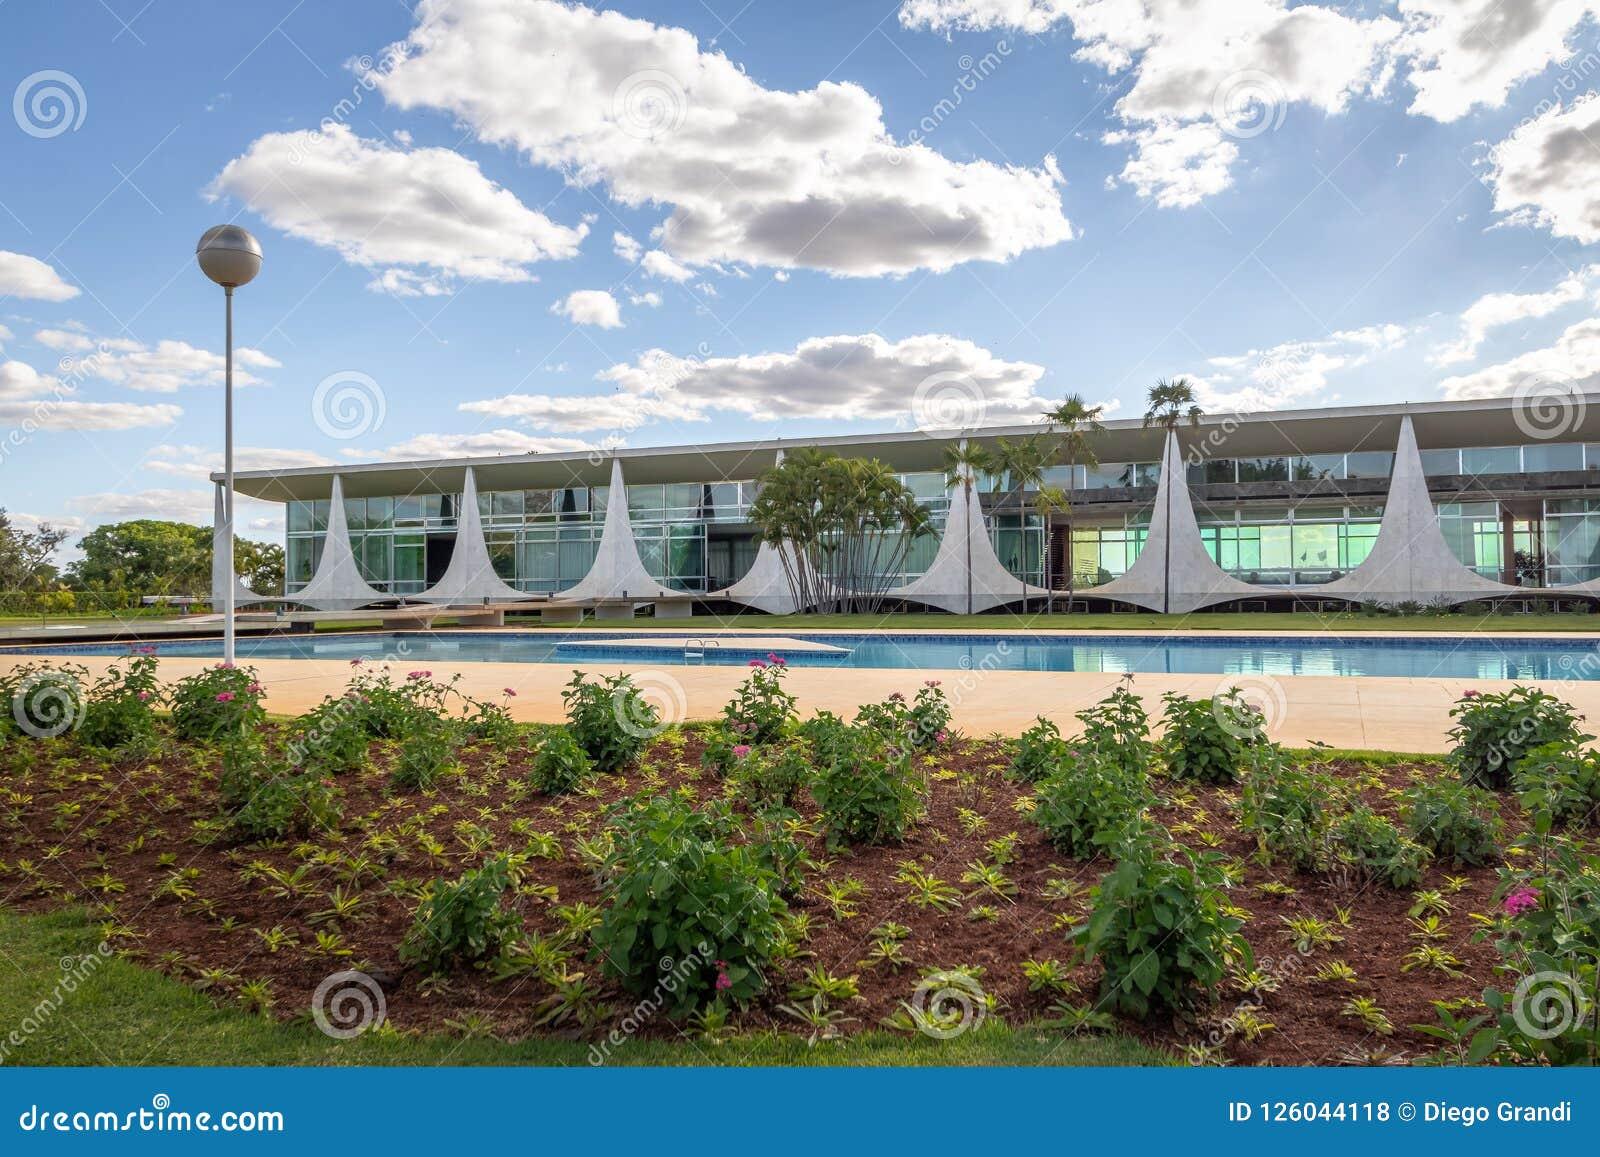 Alvorada Palace Garden And Swimming Pool Brasilia Distrito